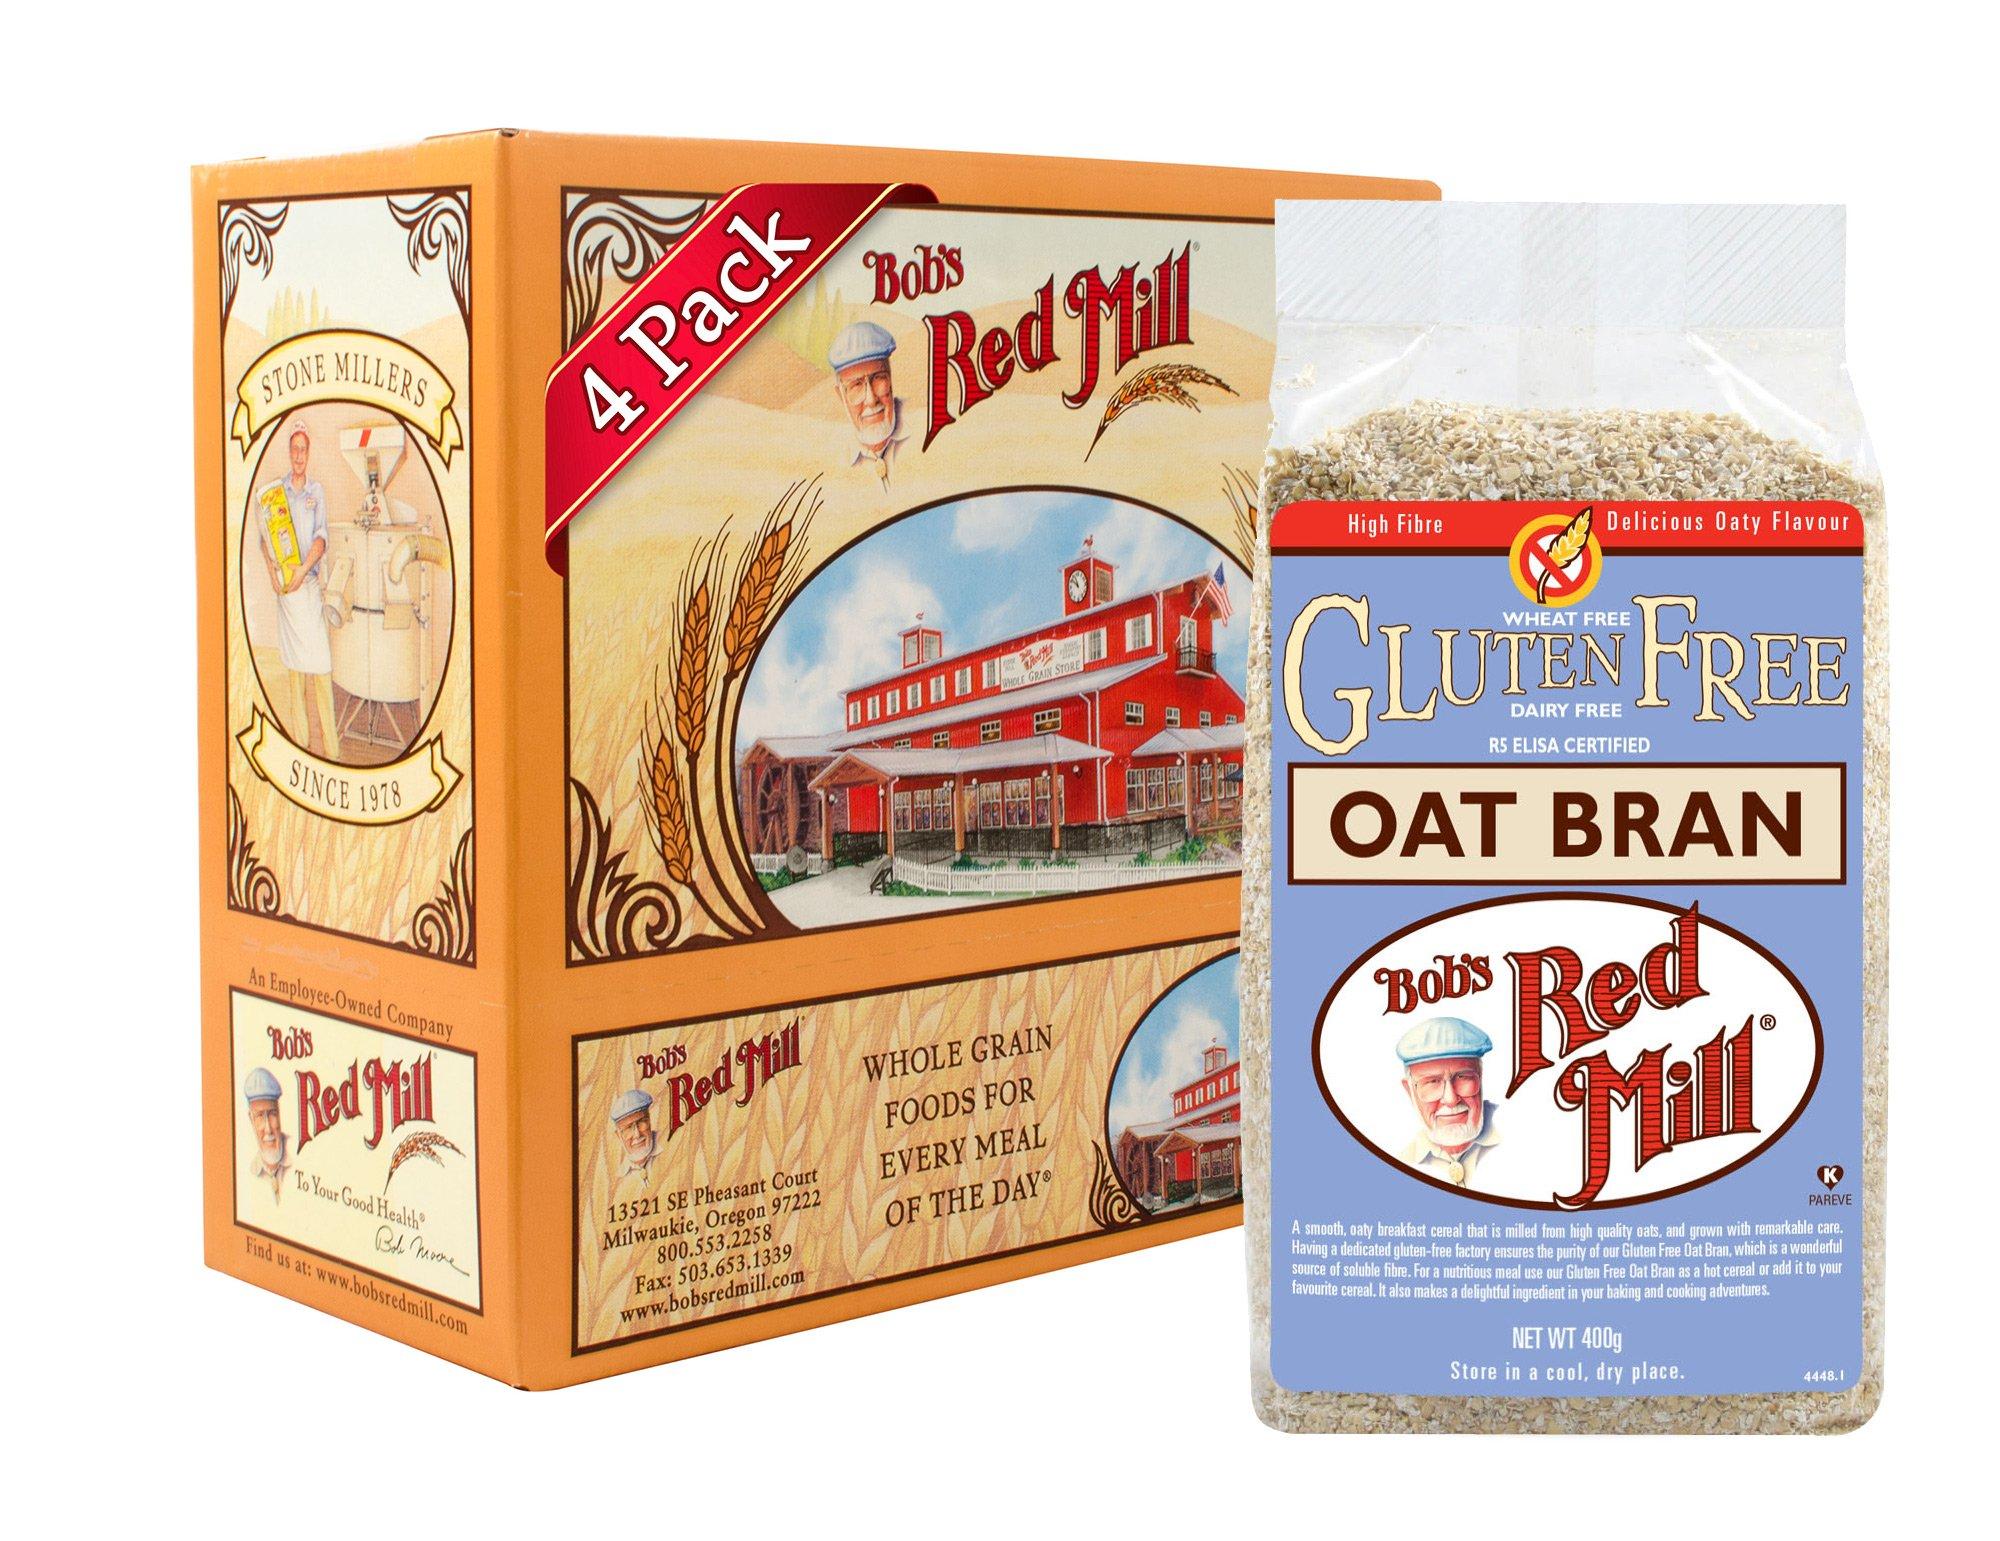 Bob's Red Mill Gluten Free Oat Bran, 18 Ounce (Pack of 4)